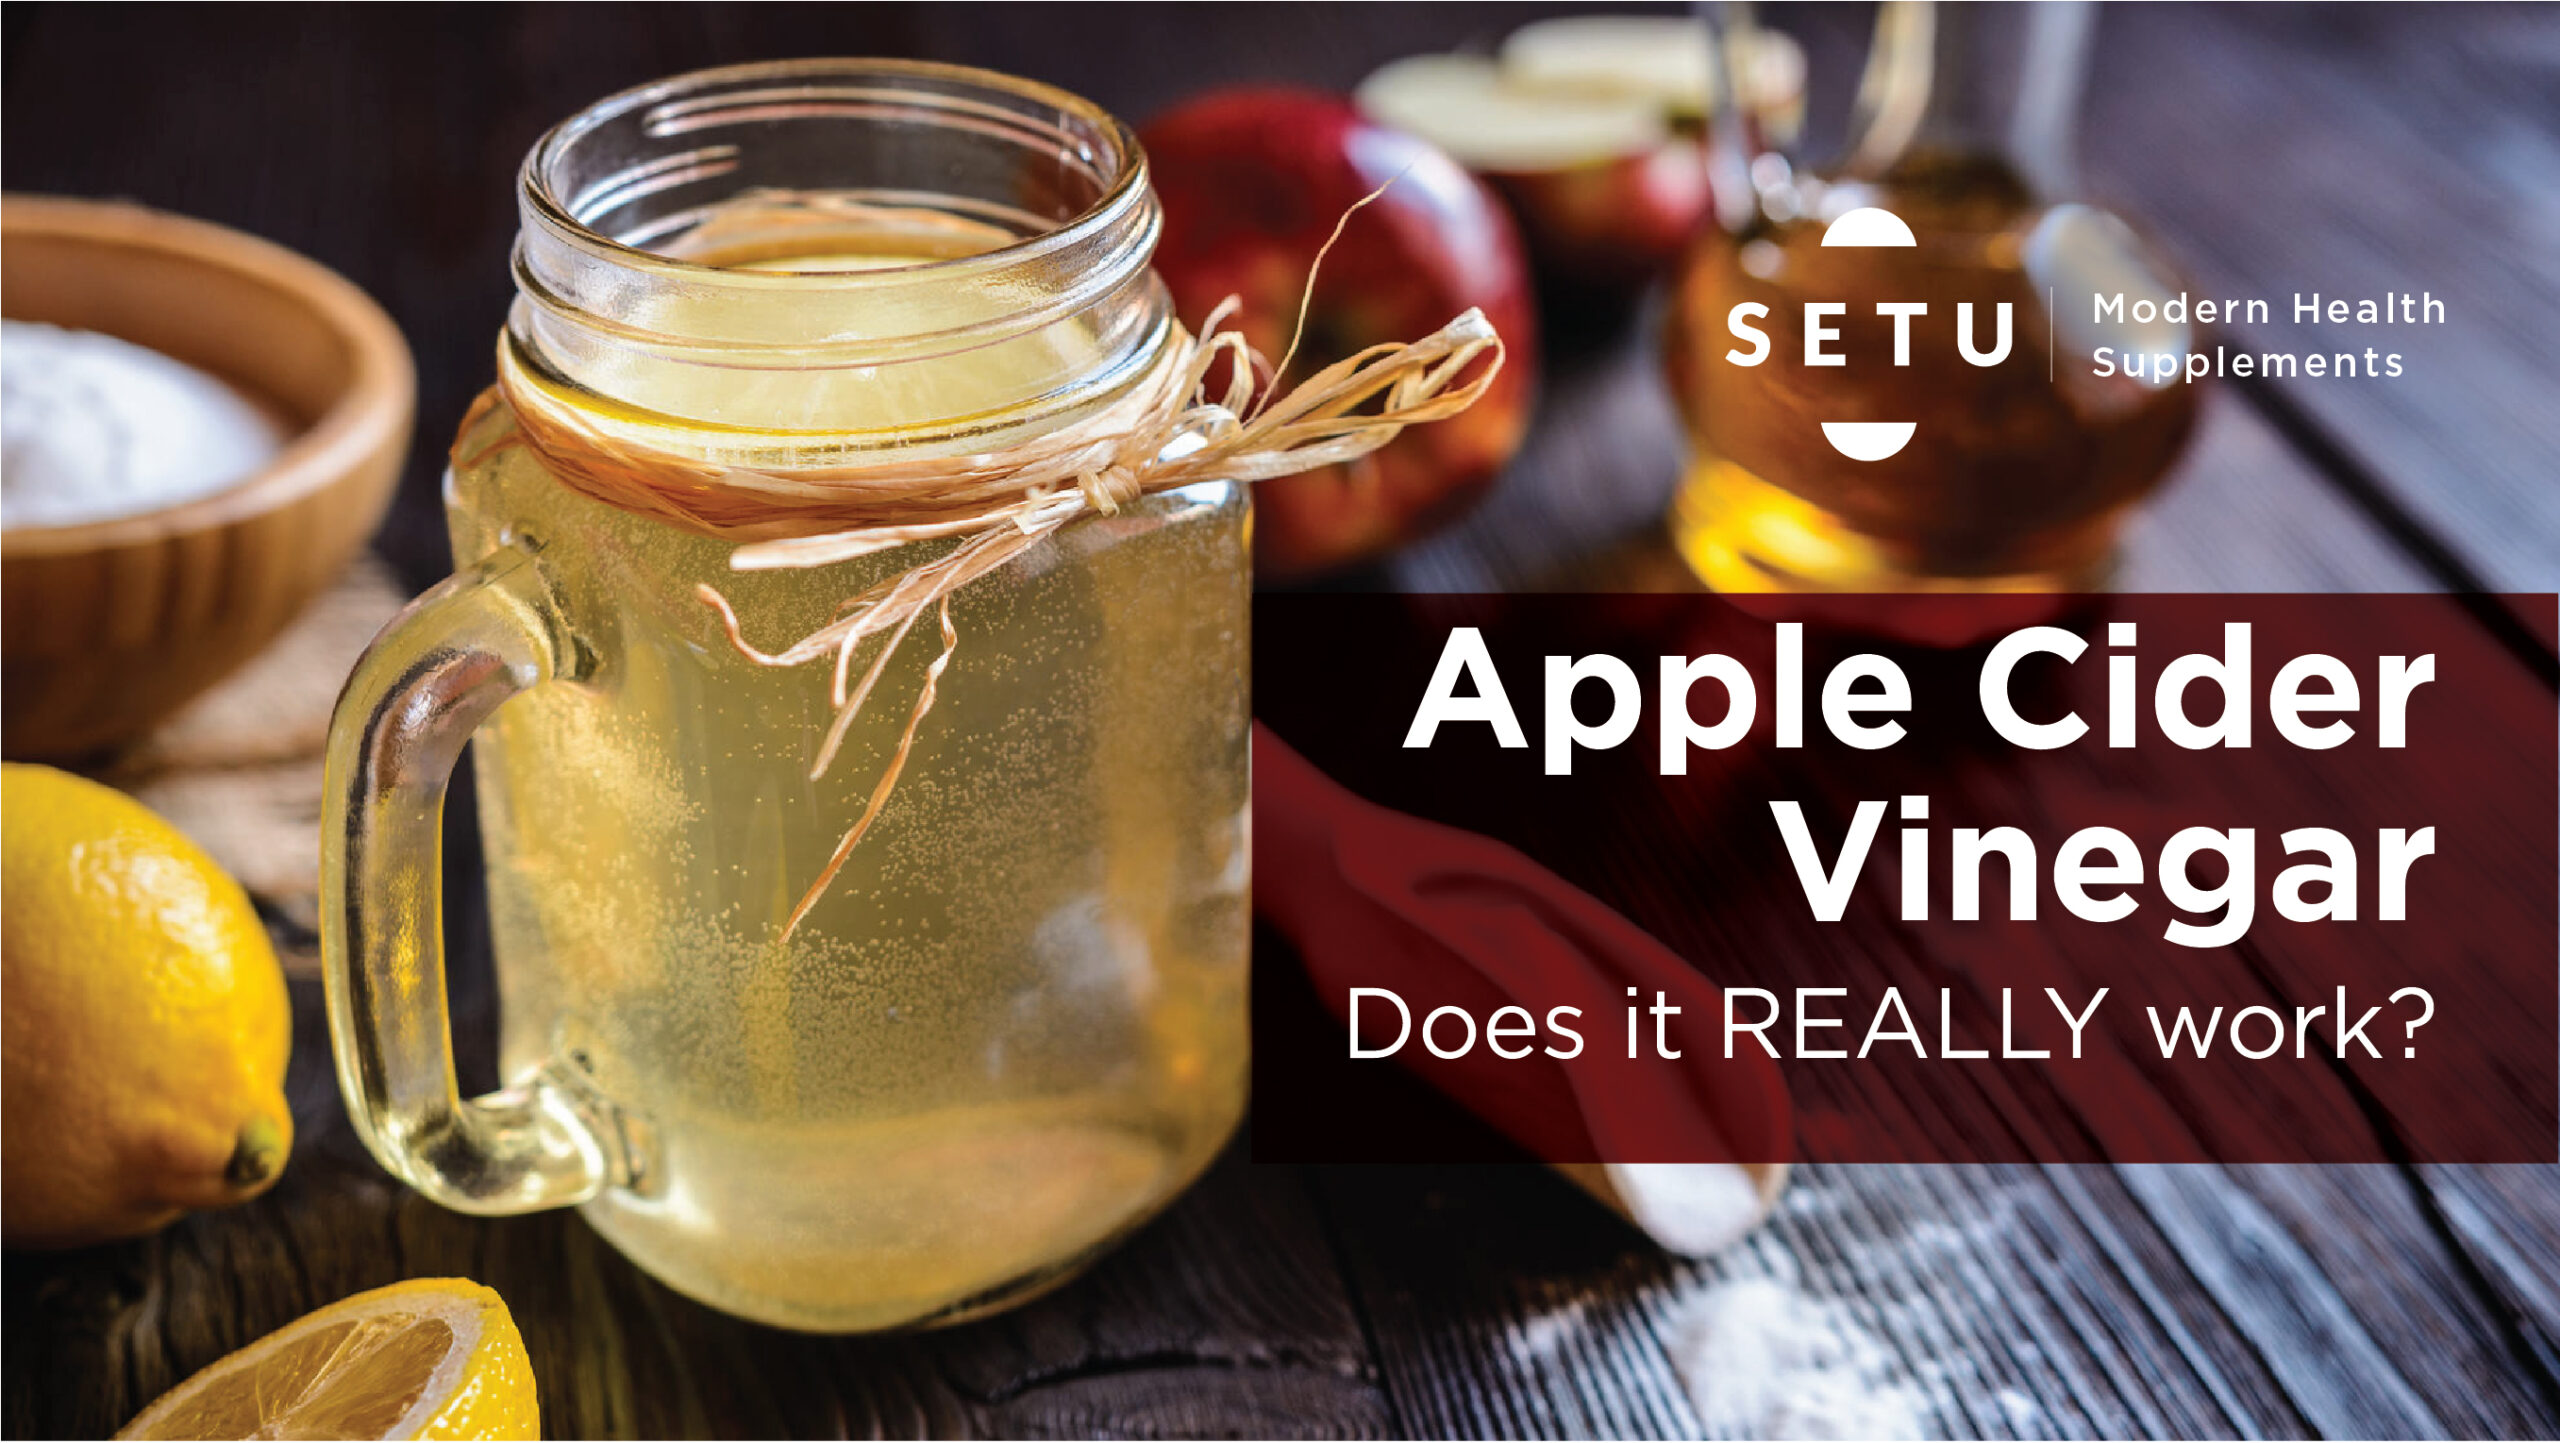 Apple Cider Vinegar - Does it really work?